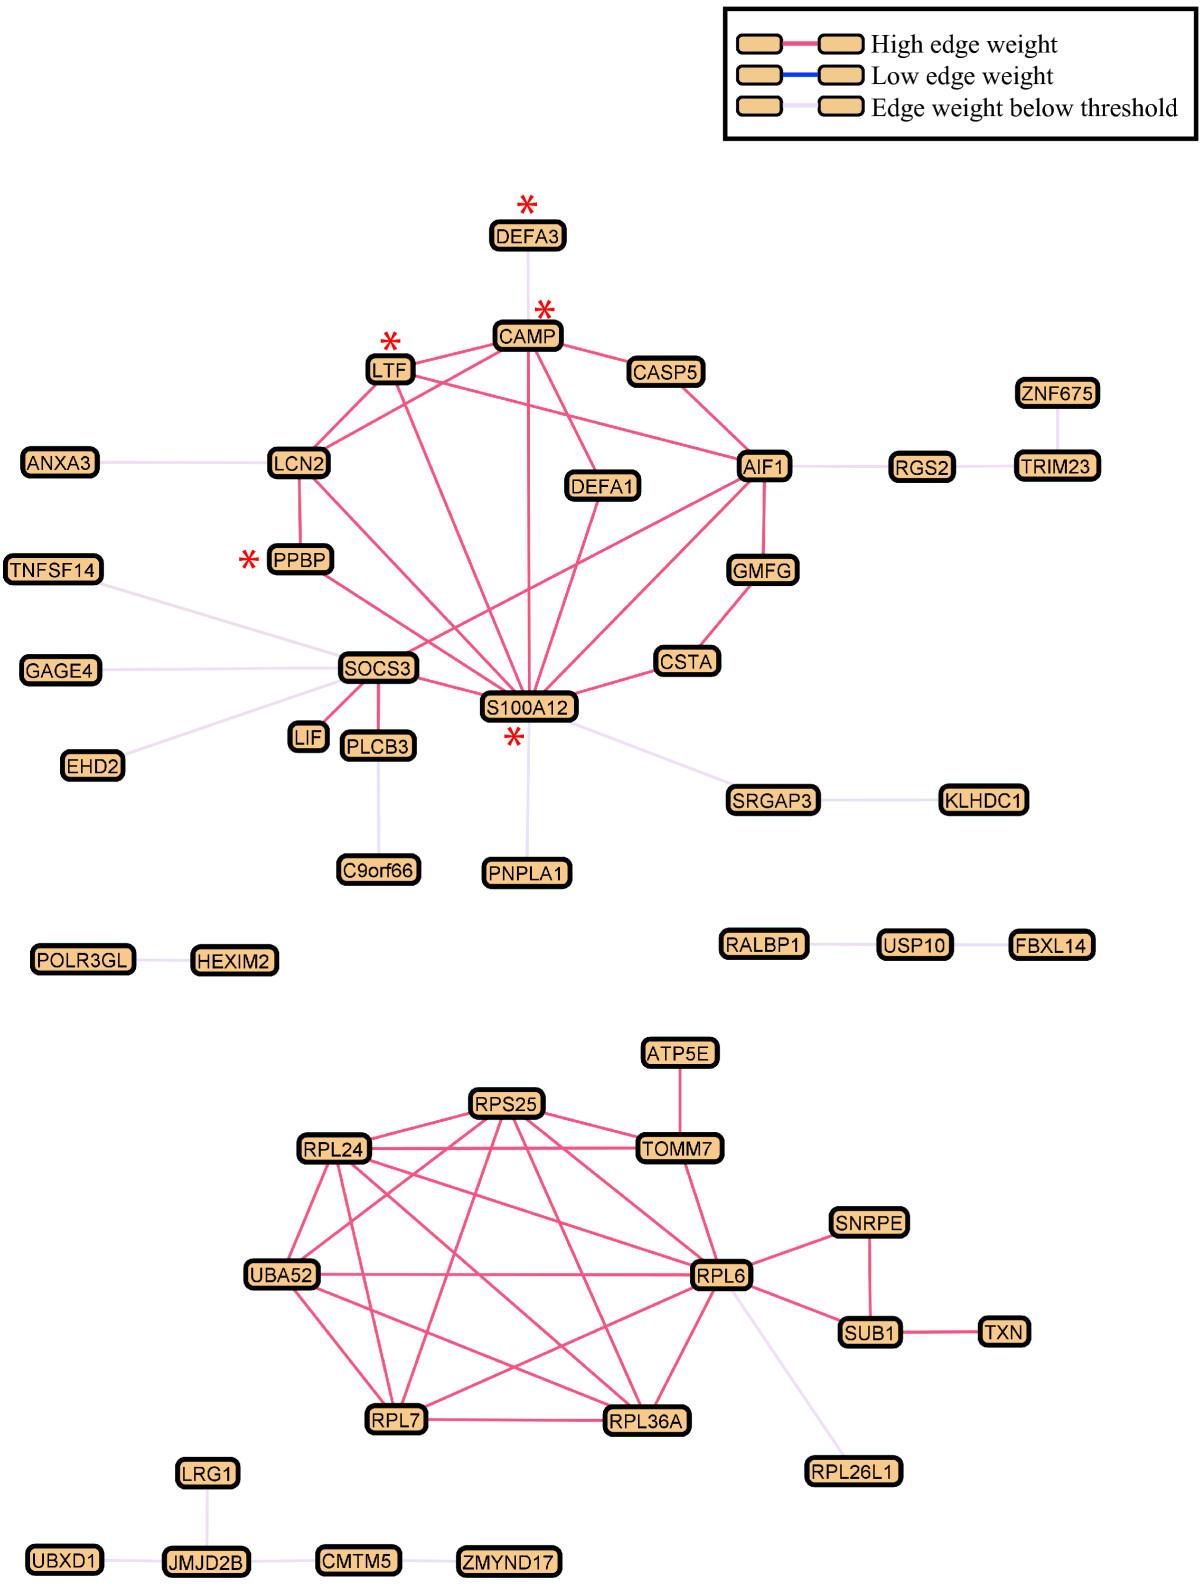 https://static-content.springer.com/image/art%3A10.1186%2Fbcr2472/MediaObjects/13058_2009_2436_Fig2_HTML.jpg